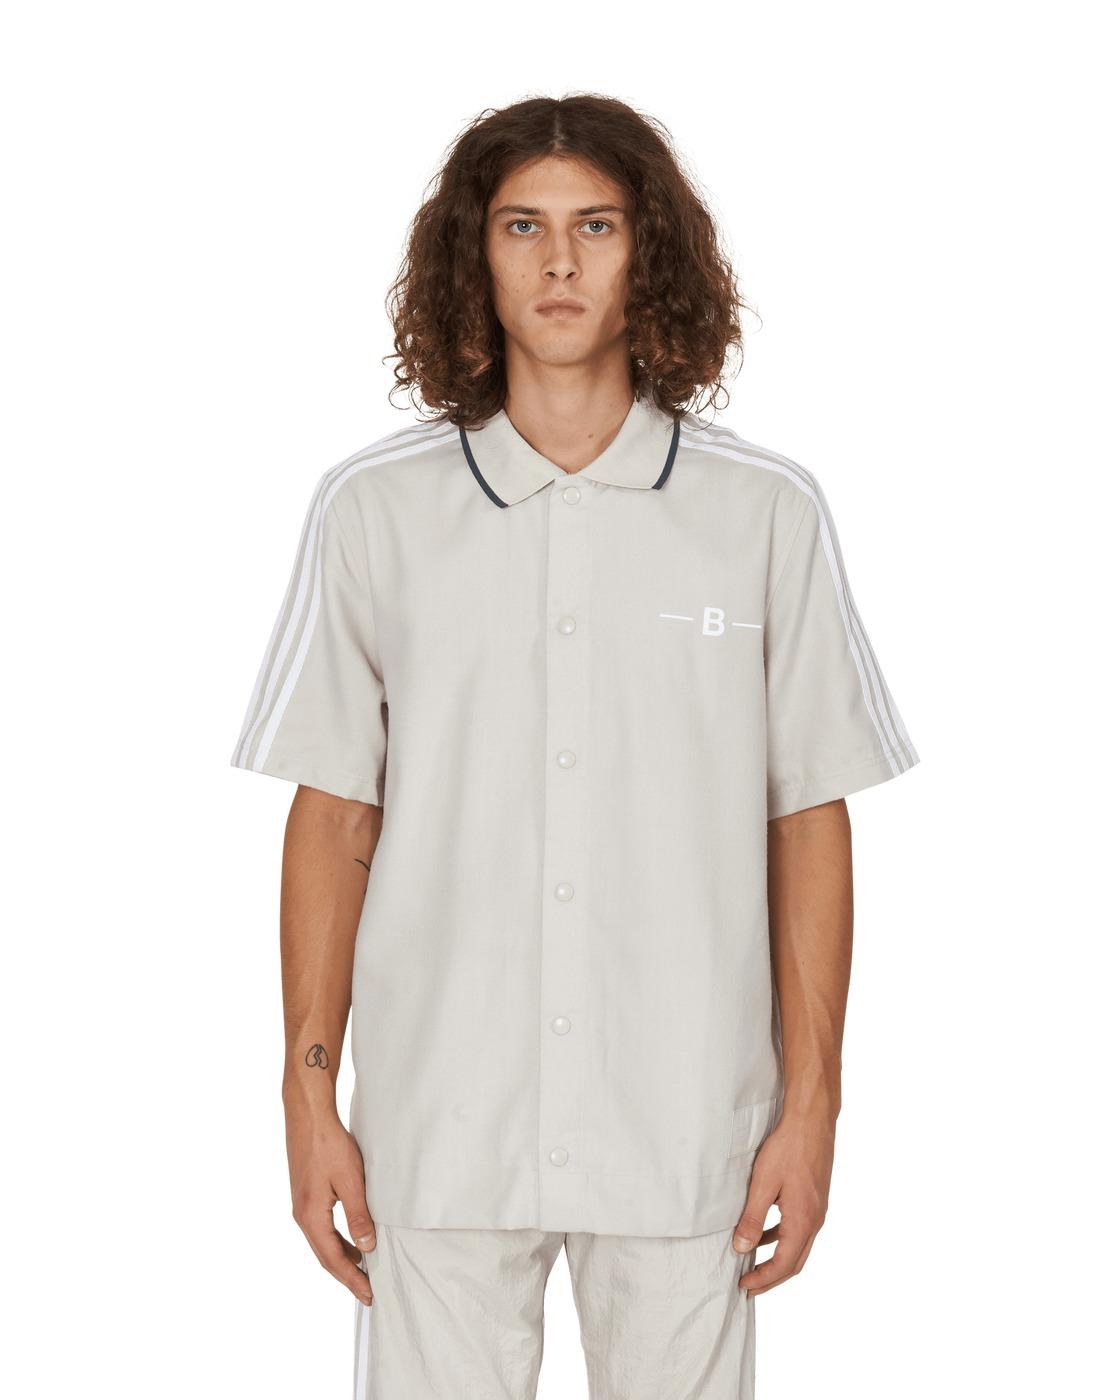 Adidas Originals Bristol Studio Shooting T Shirt Clear Brown